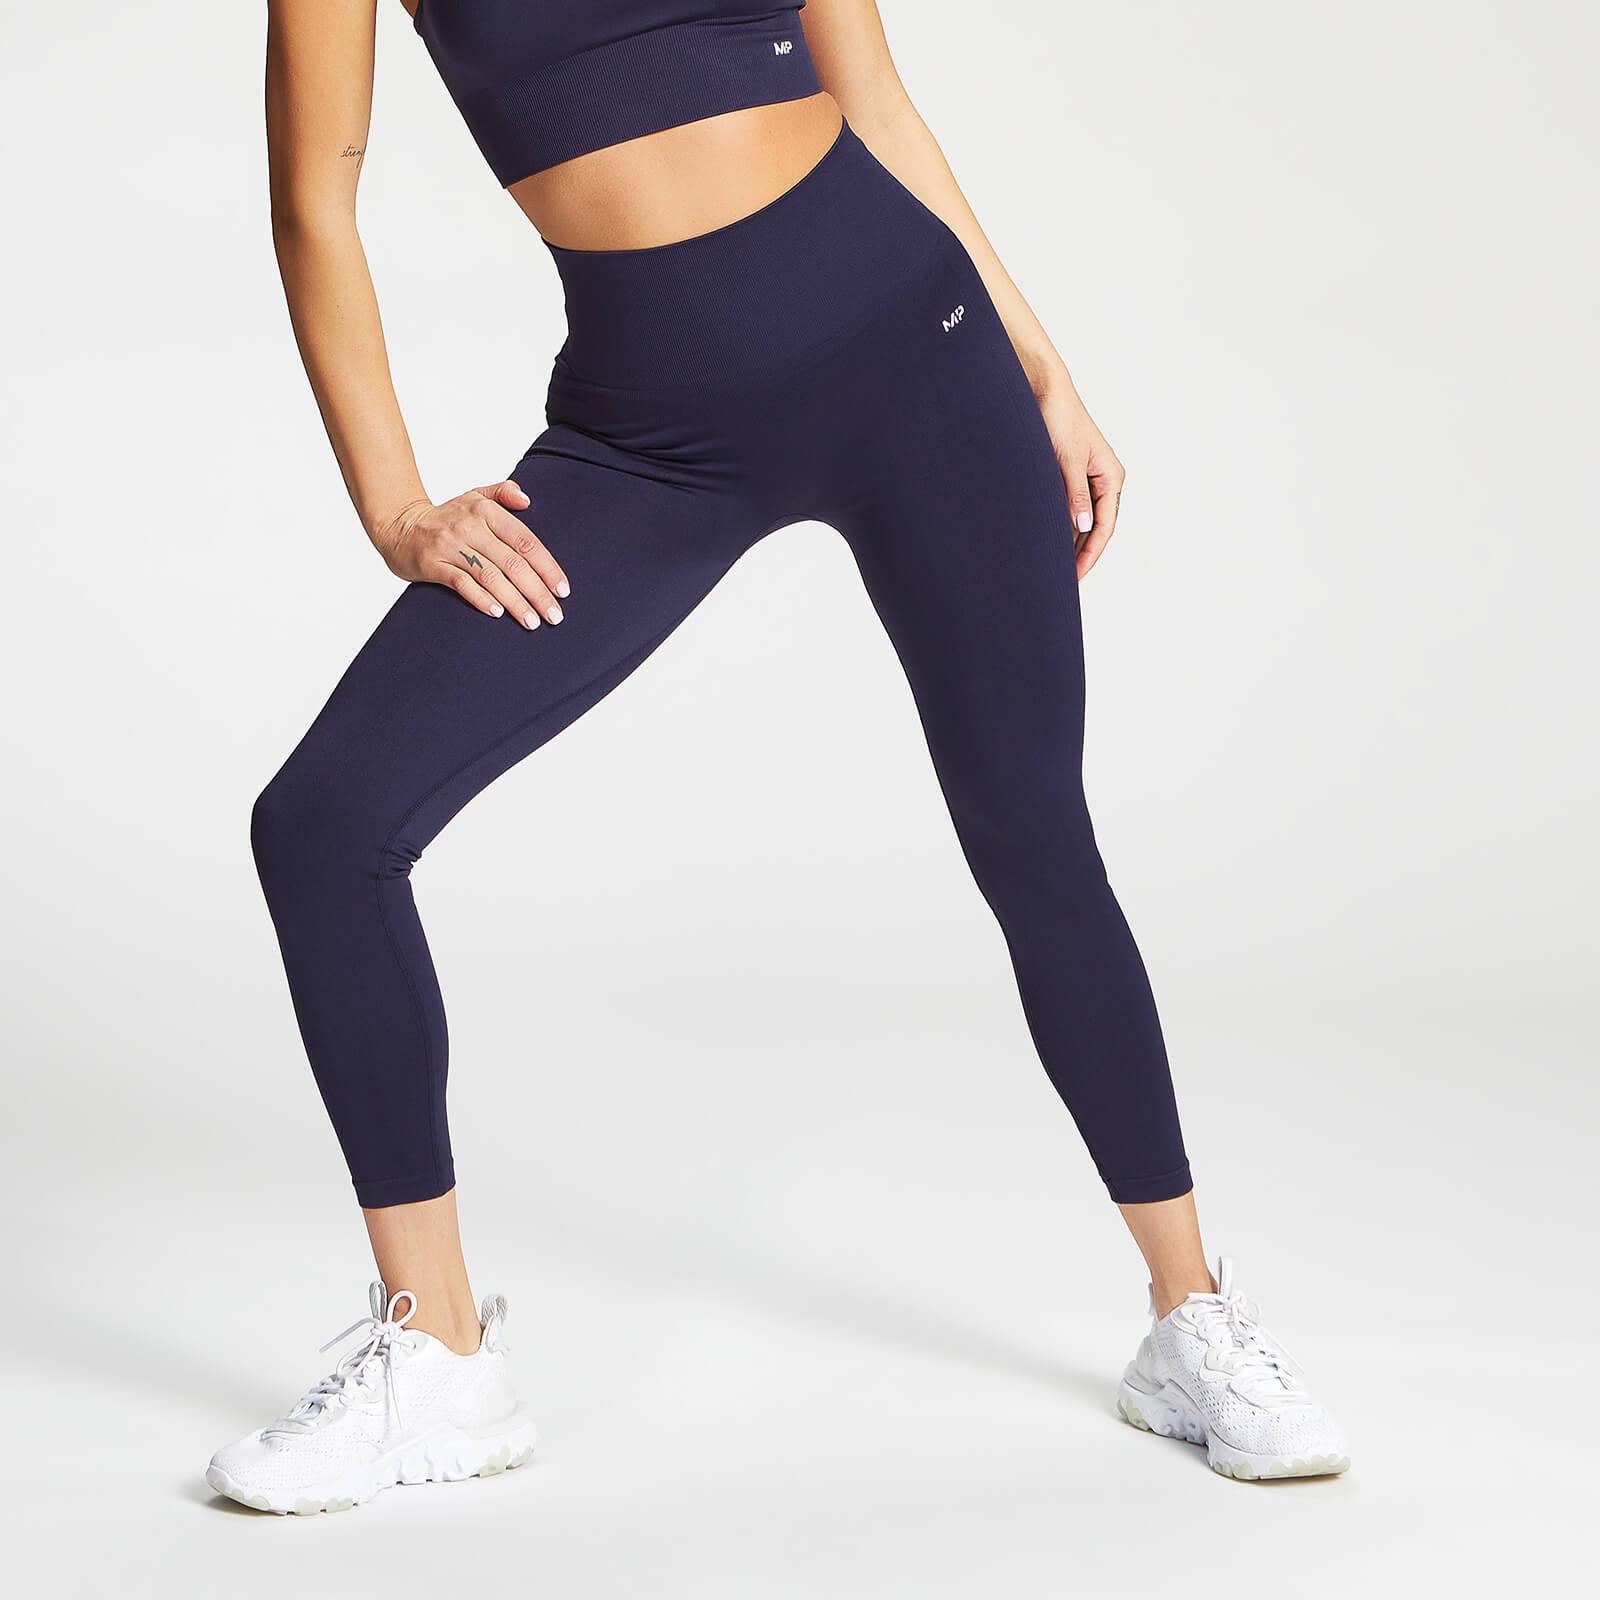 Купить MP Women's Shape Seamless Ultra 7/8 Leggings - Navy - XS, Myprotein International